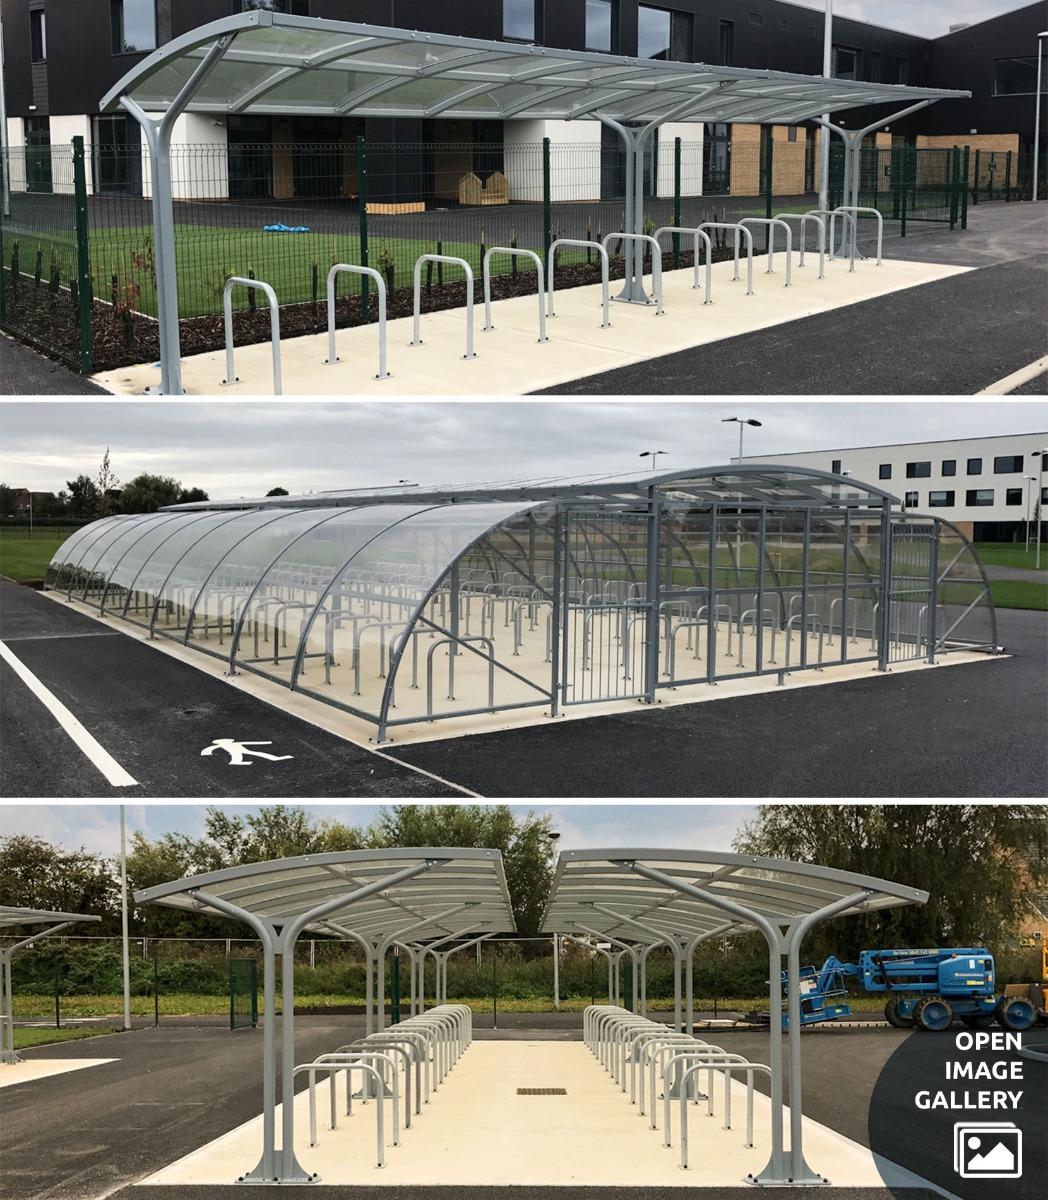 Littleport Leisure Centre